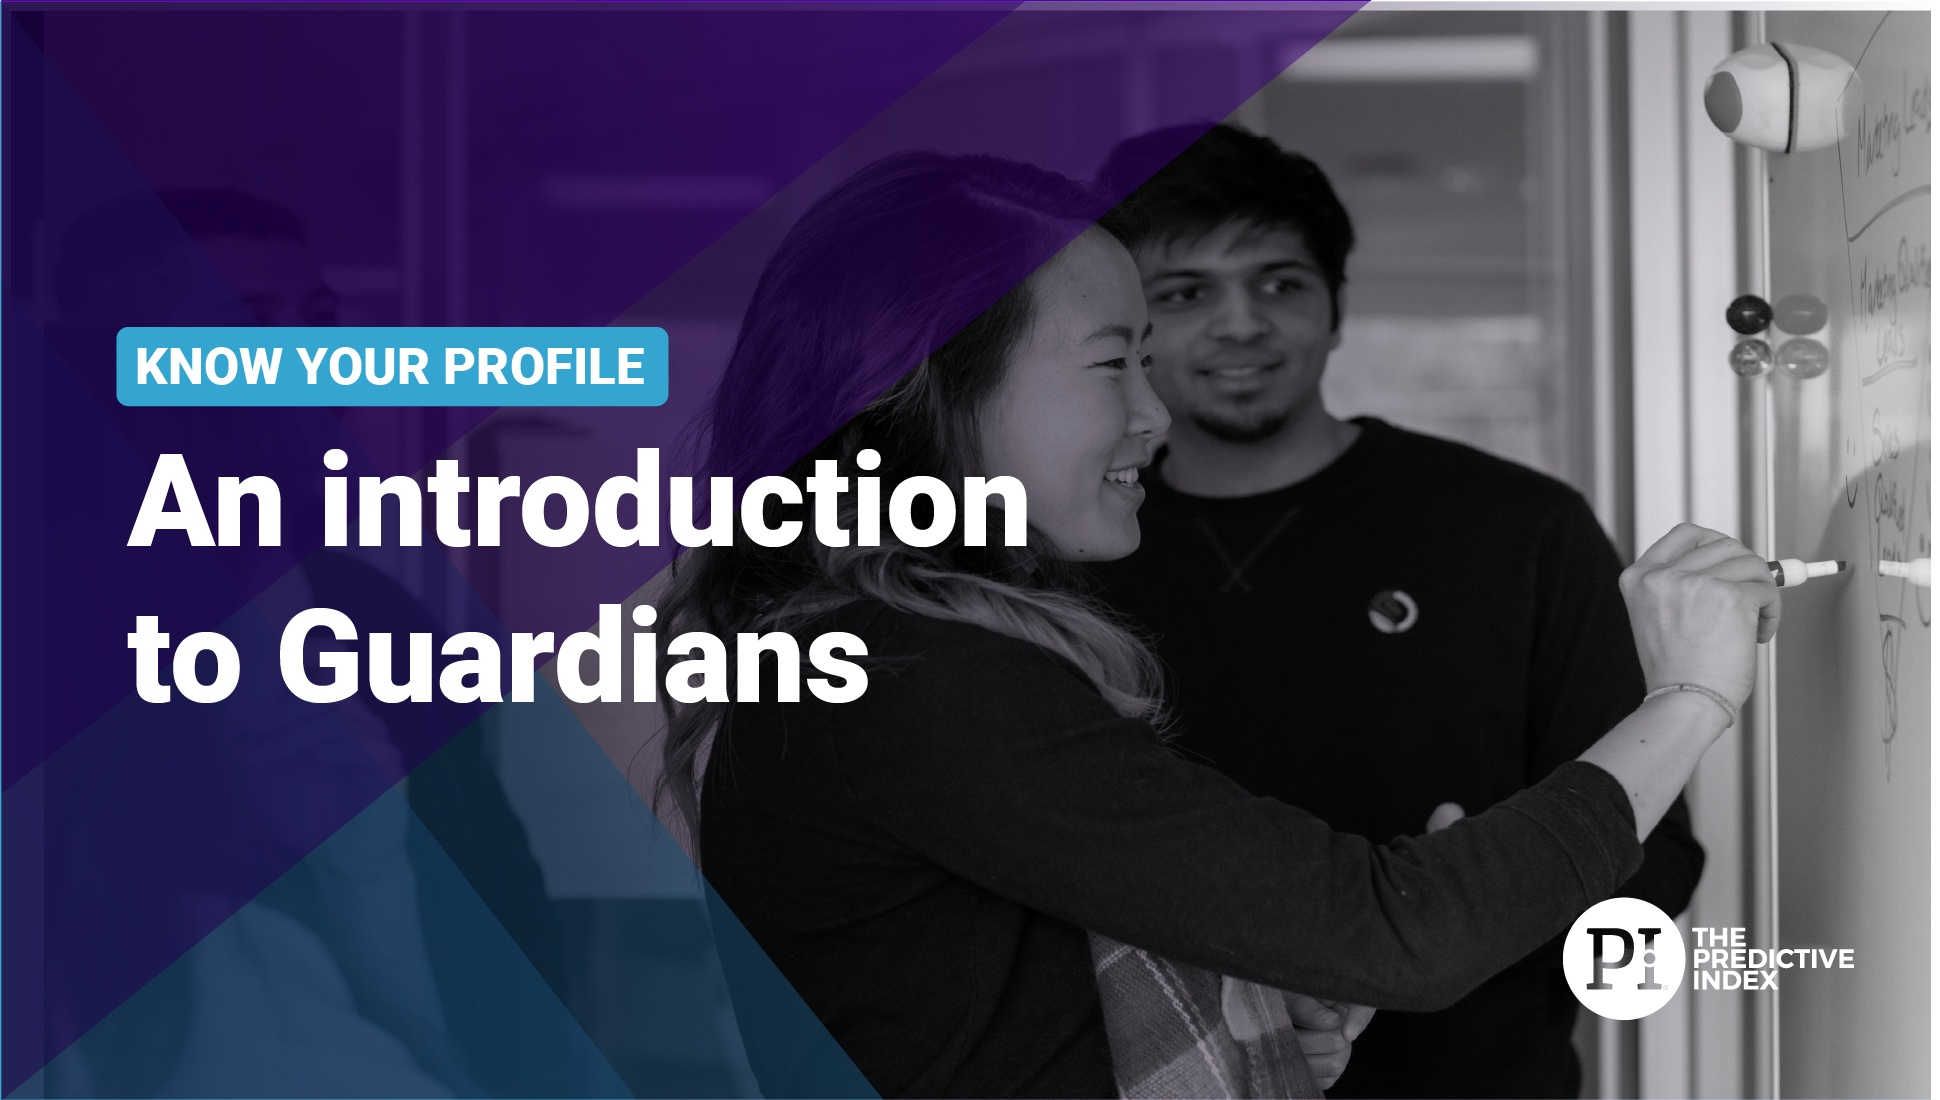 Introducing the Guardian